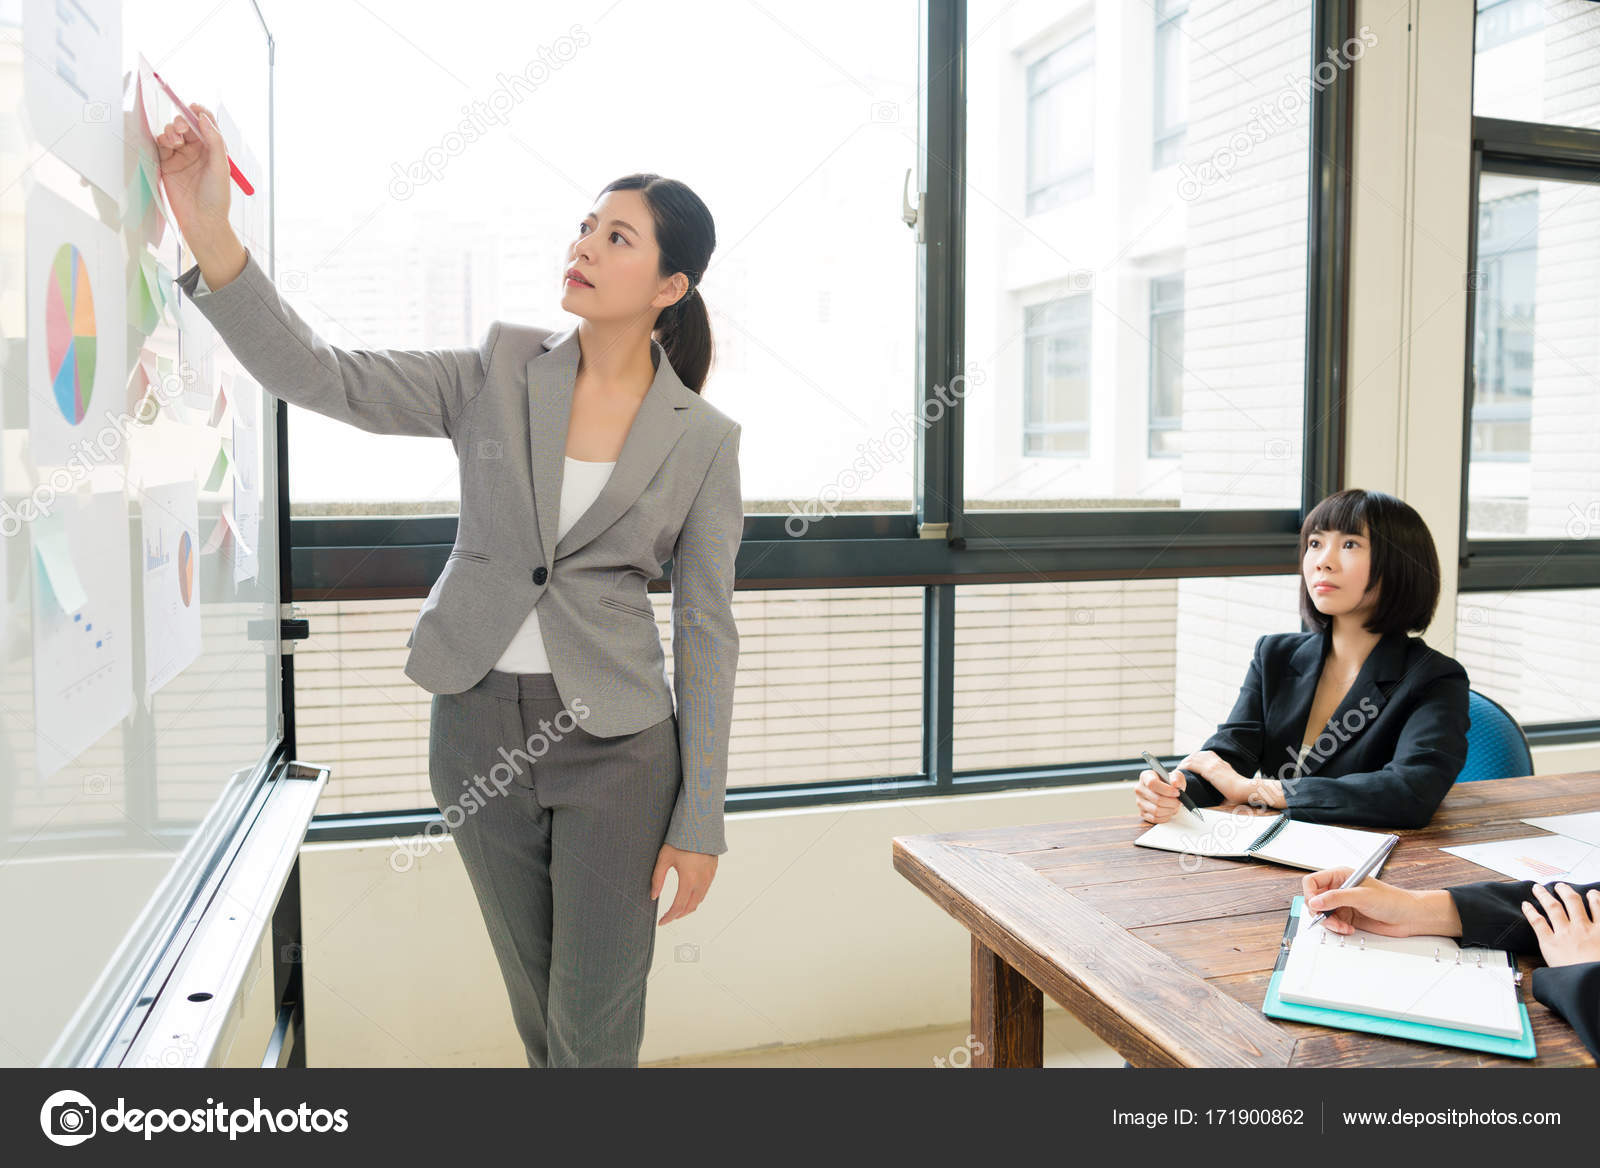 Ufficio Elegante Jobs : Gestore di lavoro elegante ufficio femminile attraente u foto